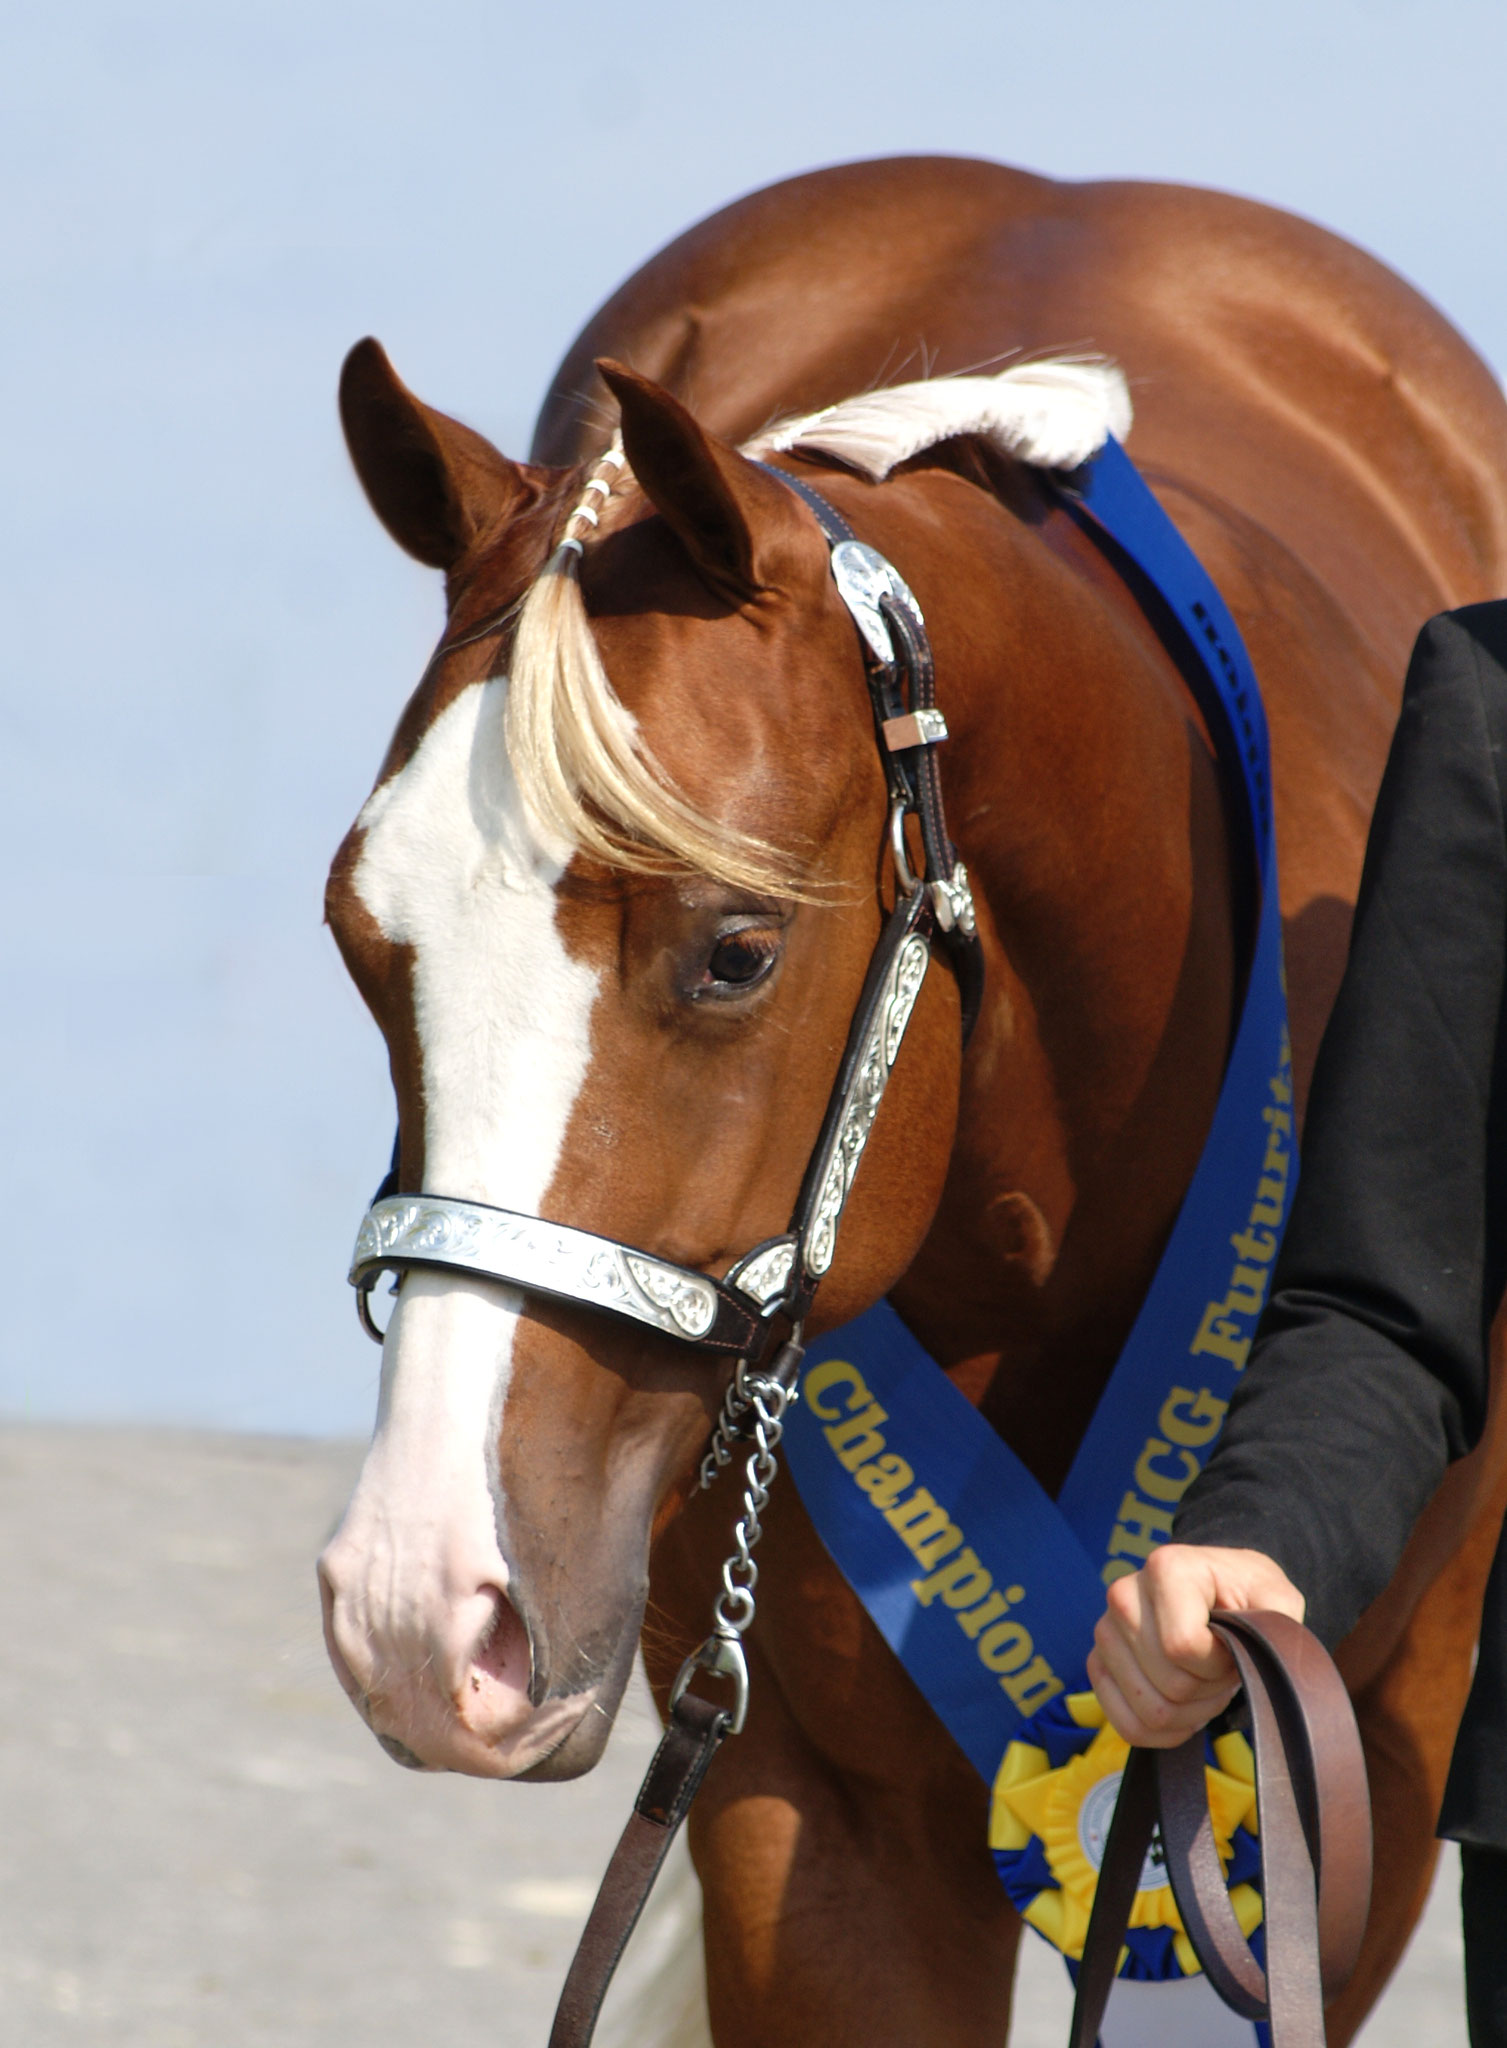 edaecc160898 Showhorses - katja-altenstrassers Webseite!